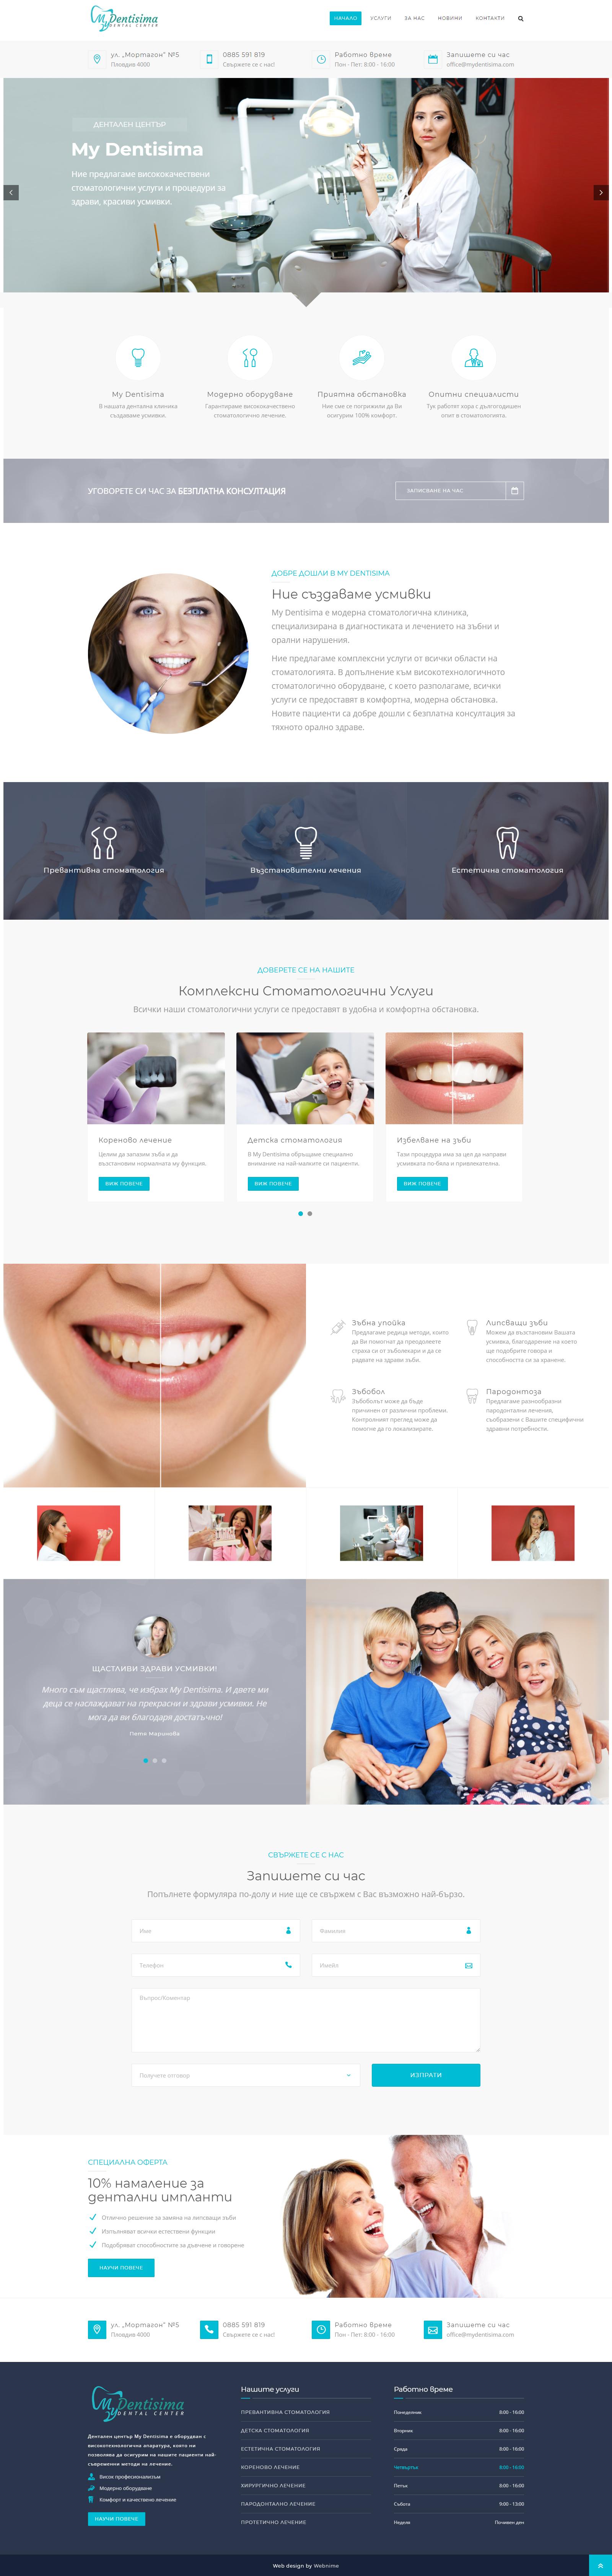 Mydentisima, zubna ordinacija